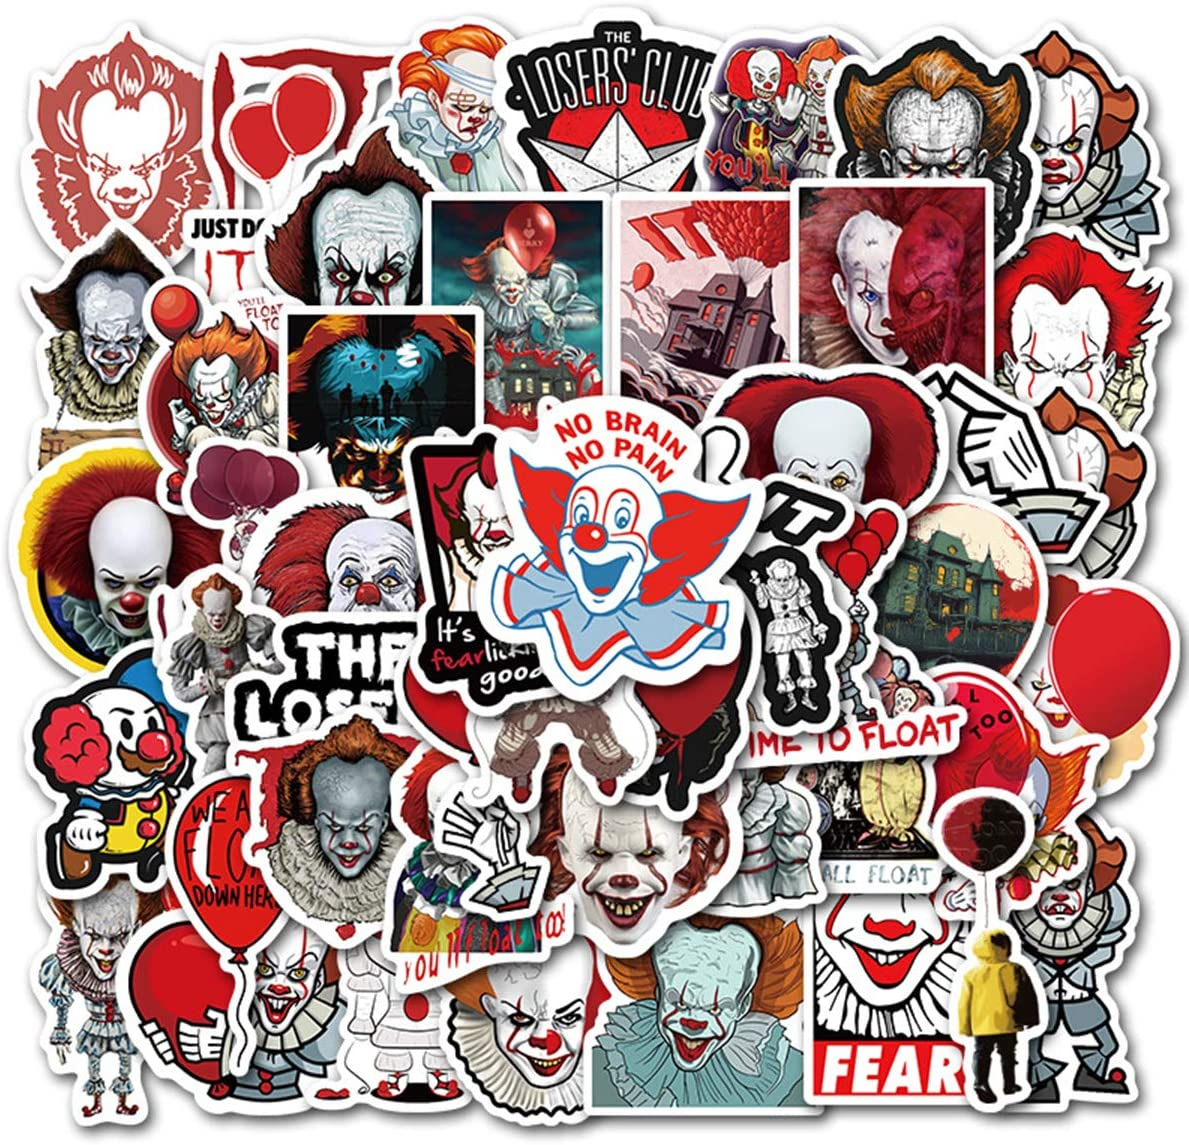 56PCS Terror Movie It Thriller Horror Style Toy Sticker for Water Bottle Skateboard Luggage Trolley Laptop Doodle Cool Sticker (Terror Movie It)